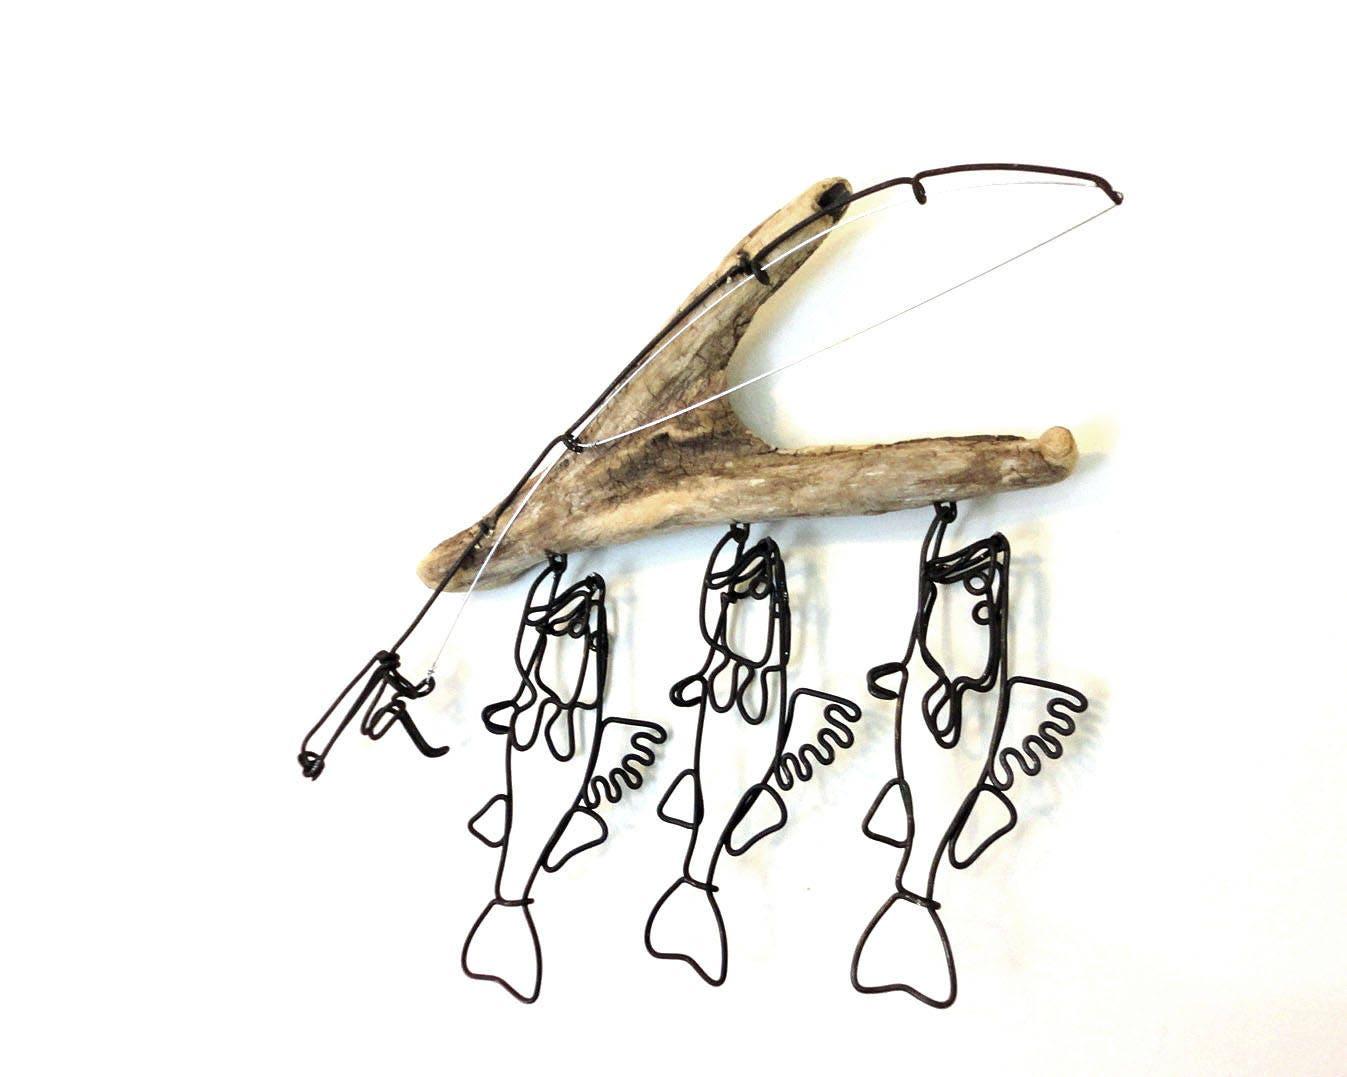 Zander Stringer und Angelrute Draht-Skulptur Zander Draht